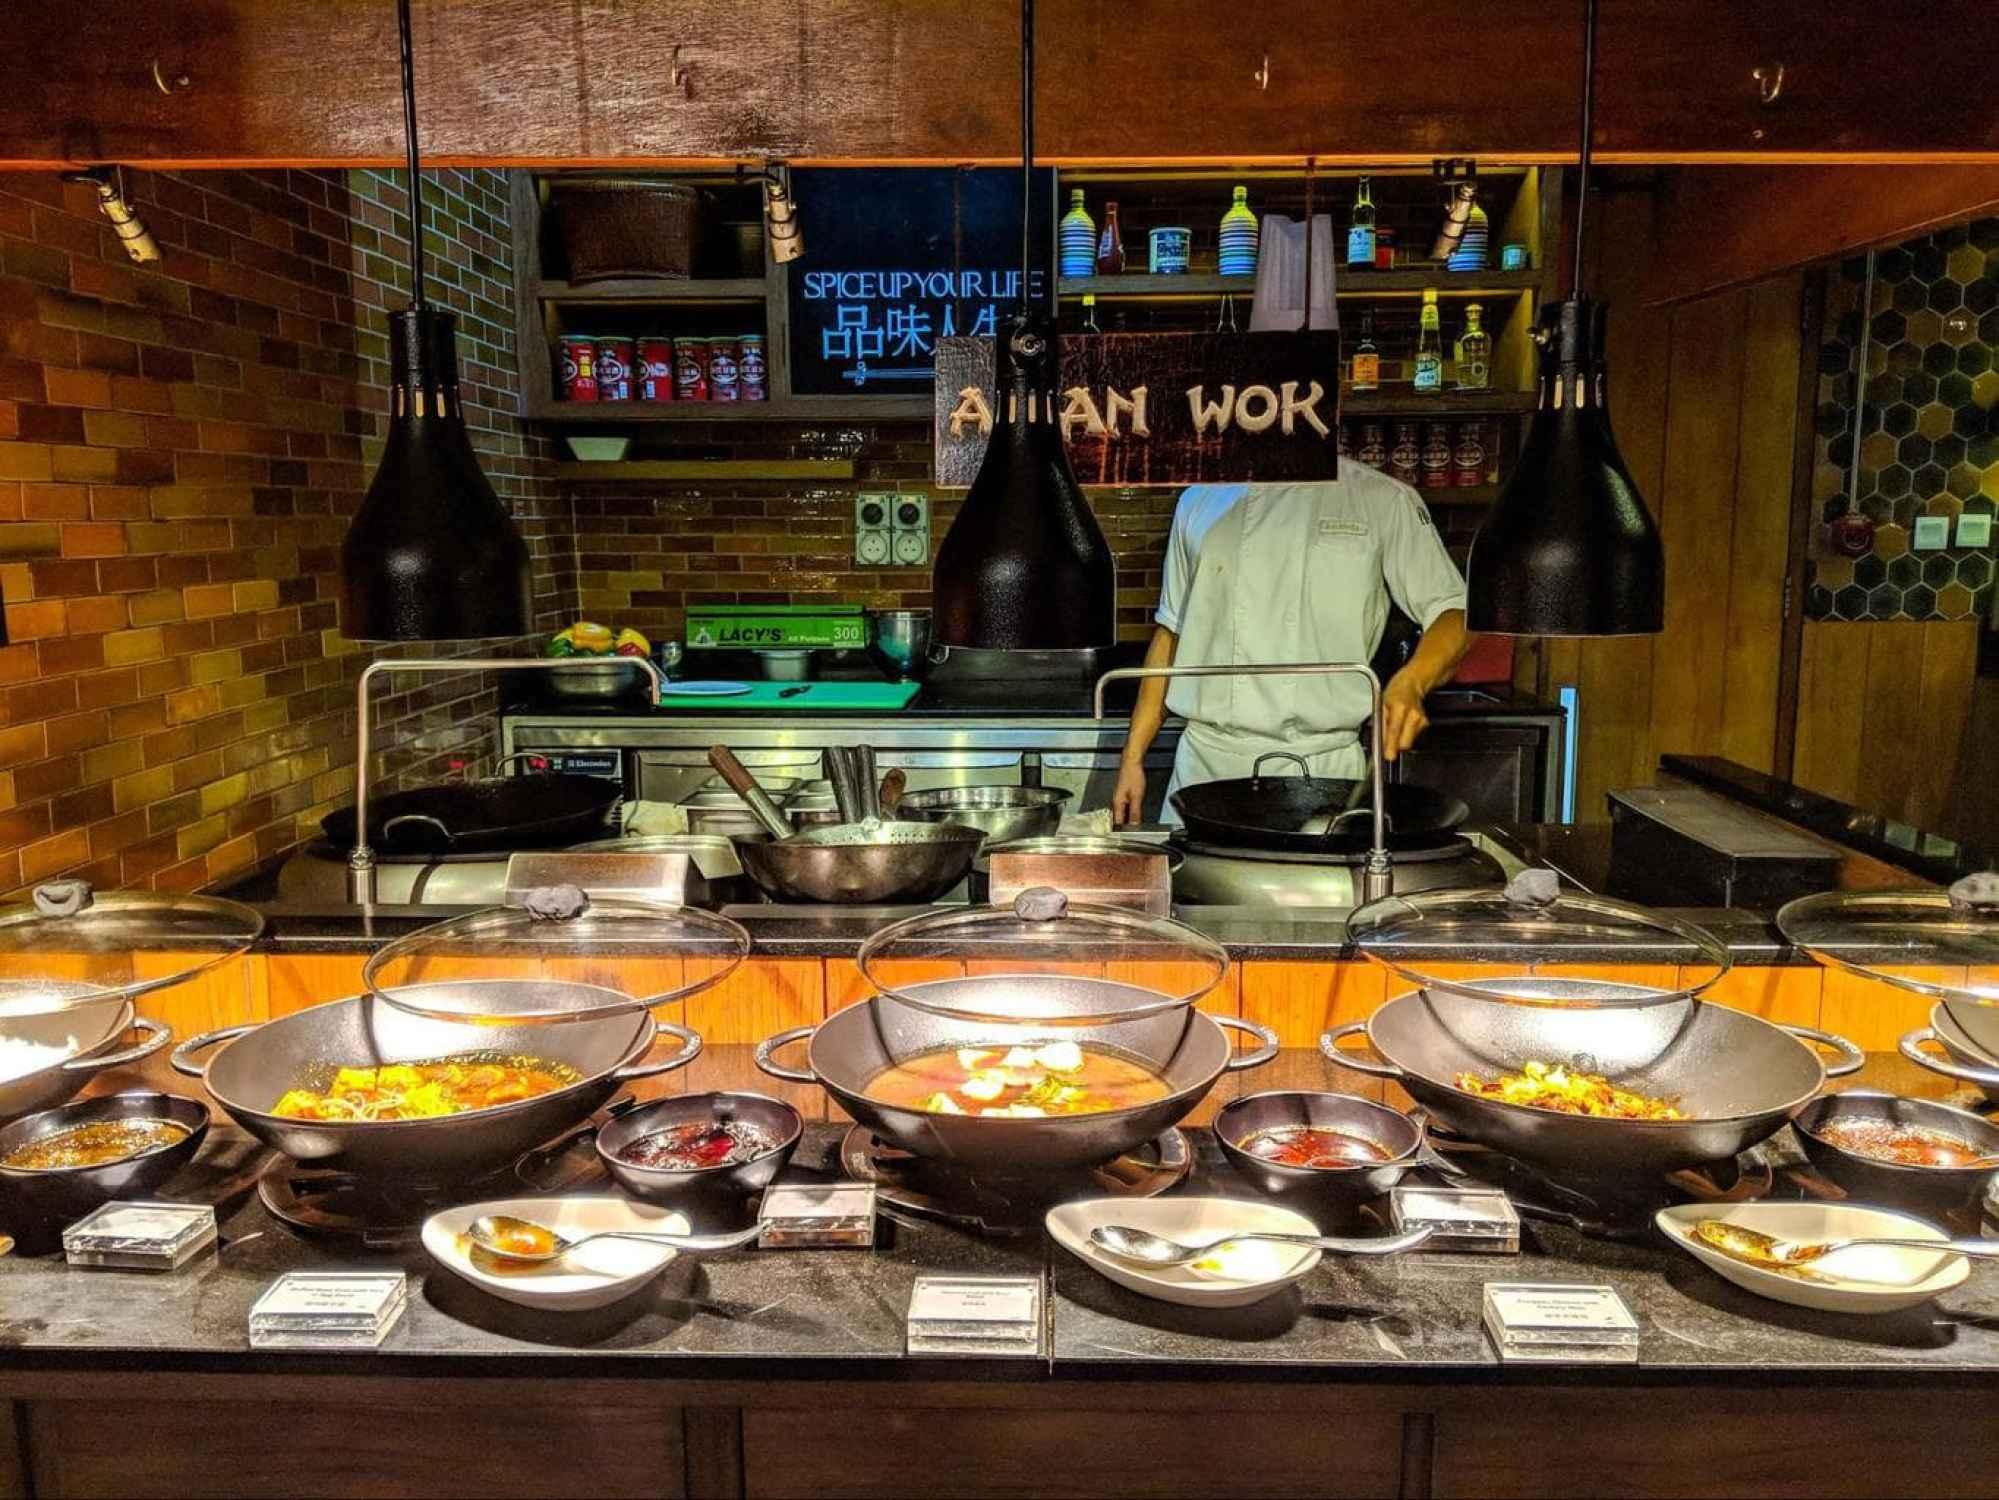 Asian wok at East Market